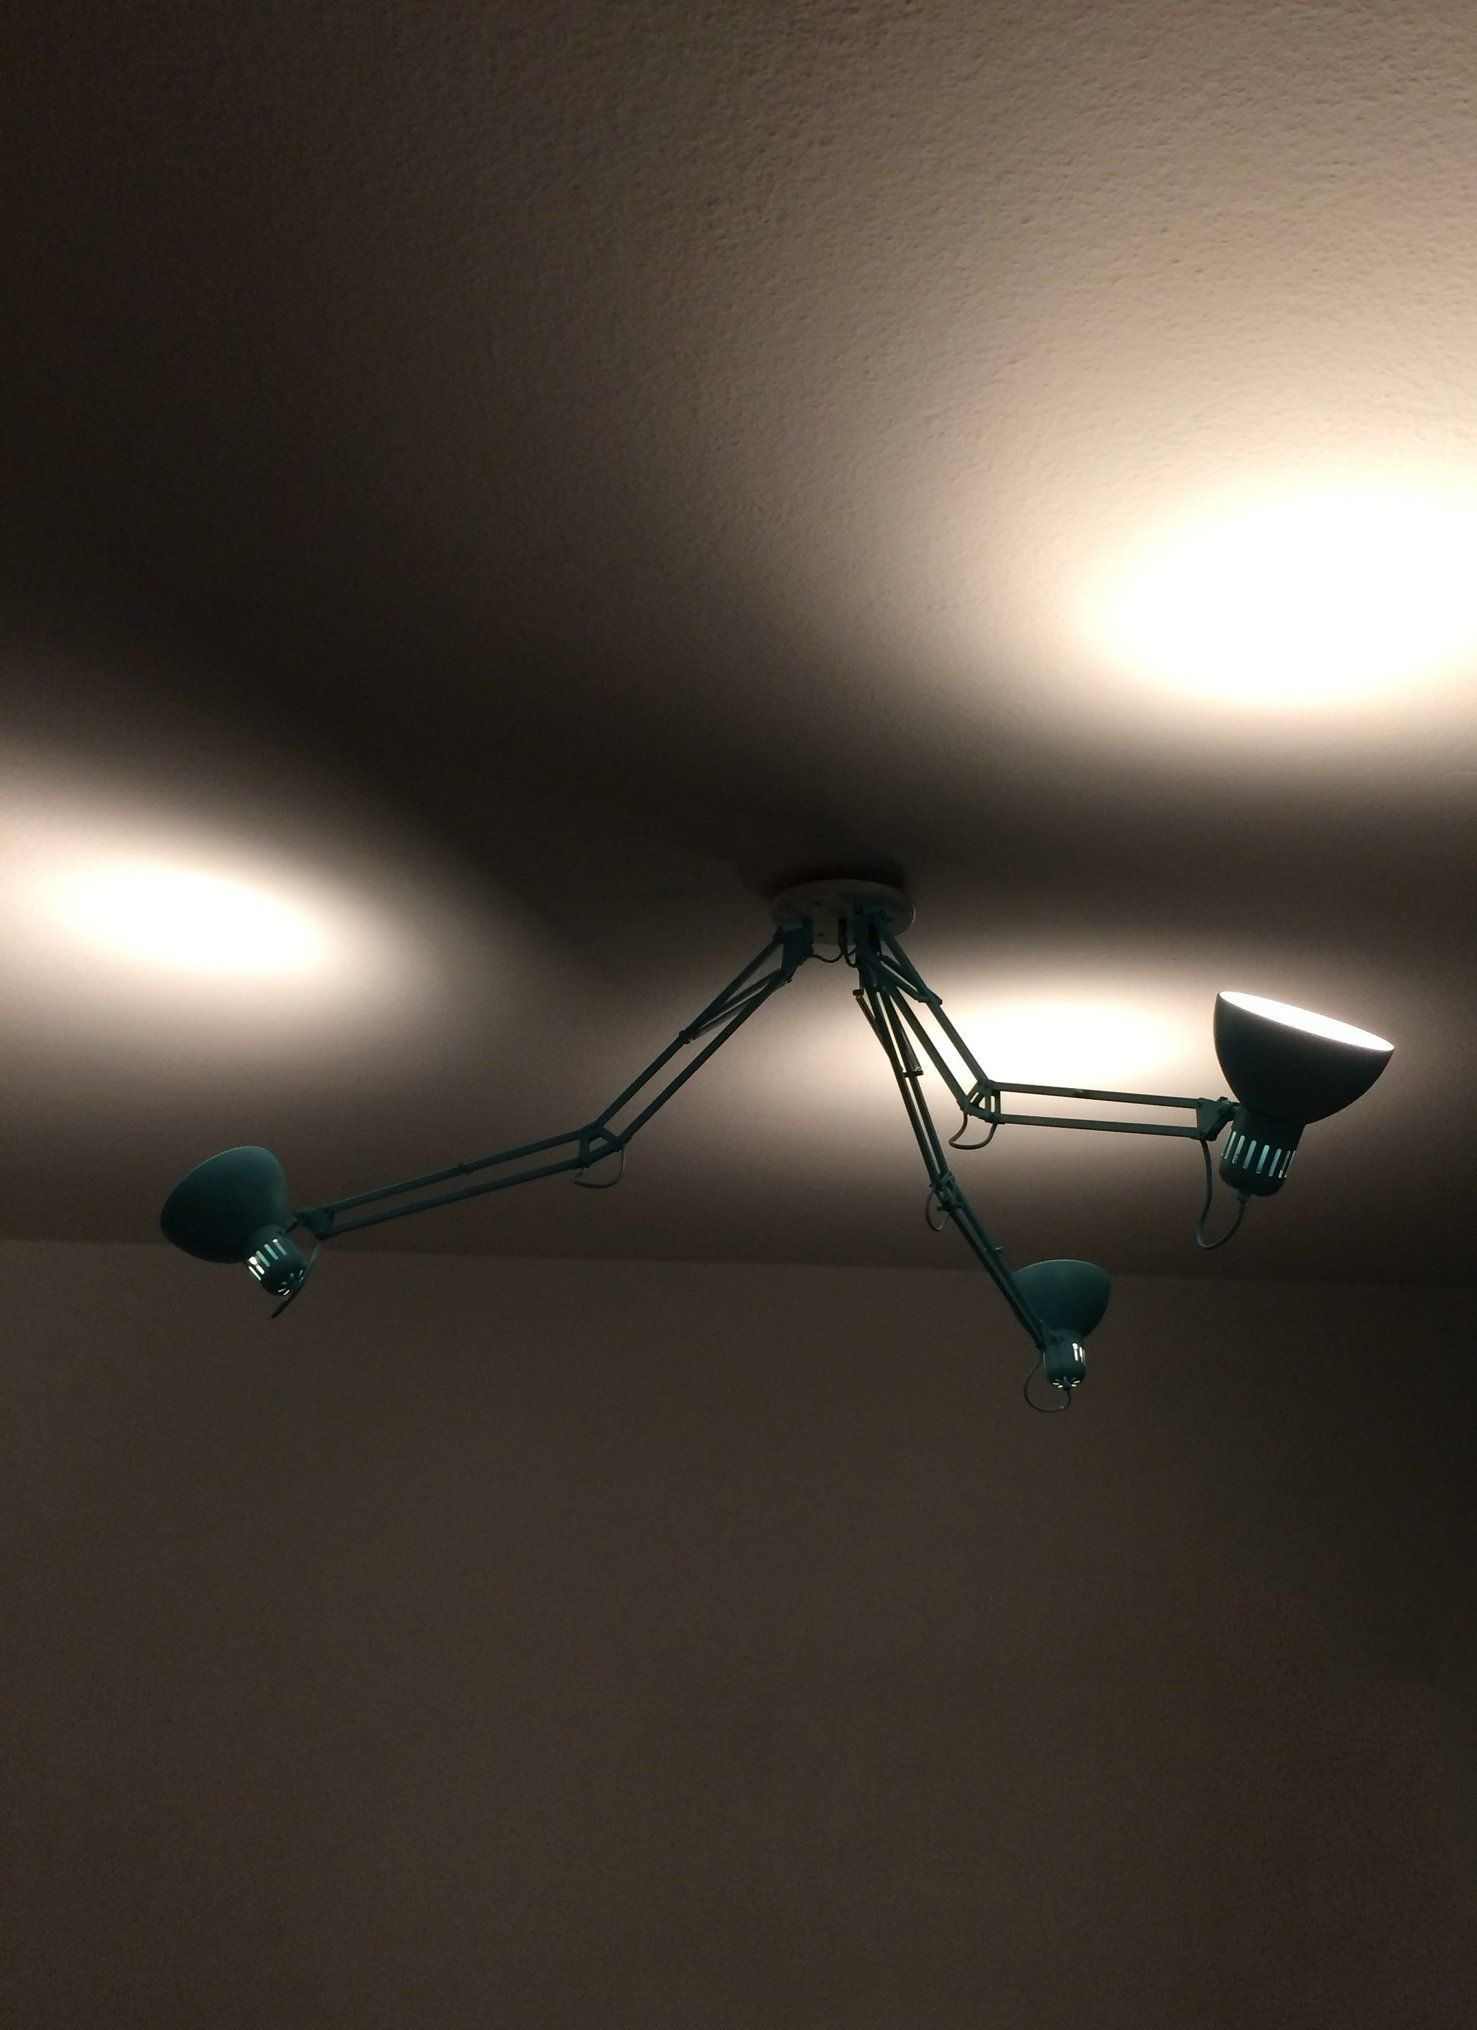 Ikea Hack Flashback Flipped Tertial Lamps Become Single Ceiling Light Ceiling Lights Ikea Hack Light